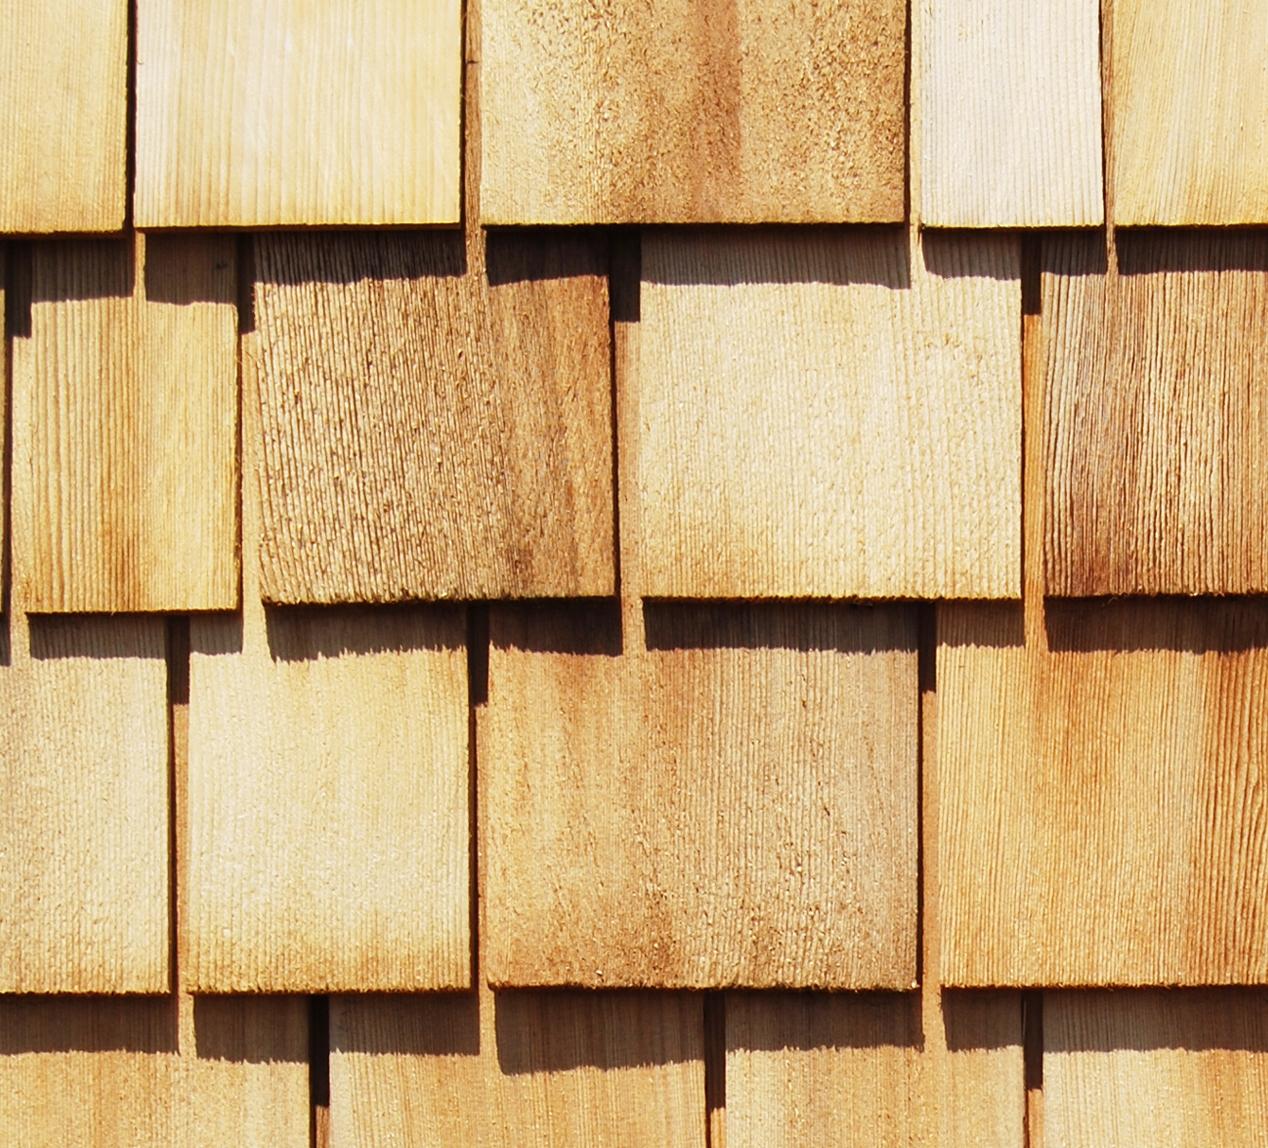 Analysis Of Hardwood Cellulose Content Of Hardwood Lignin